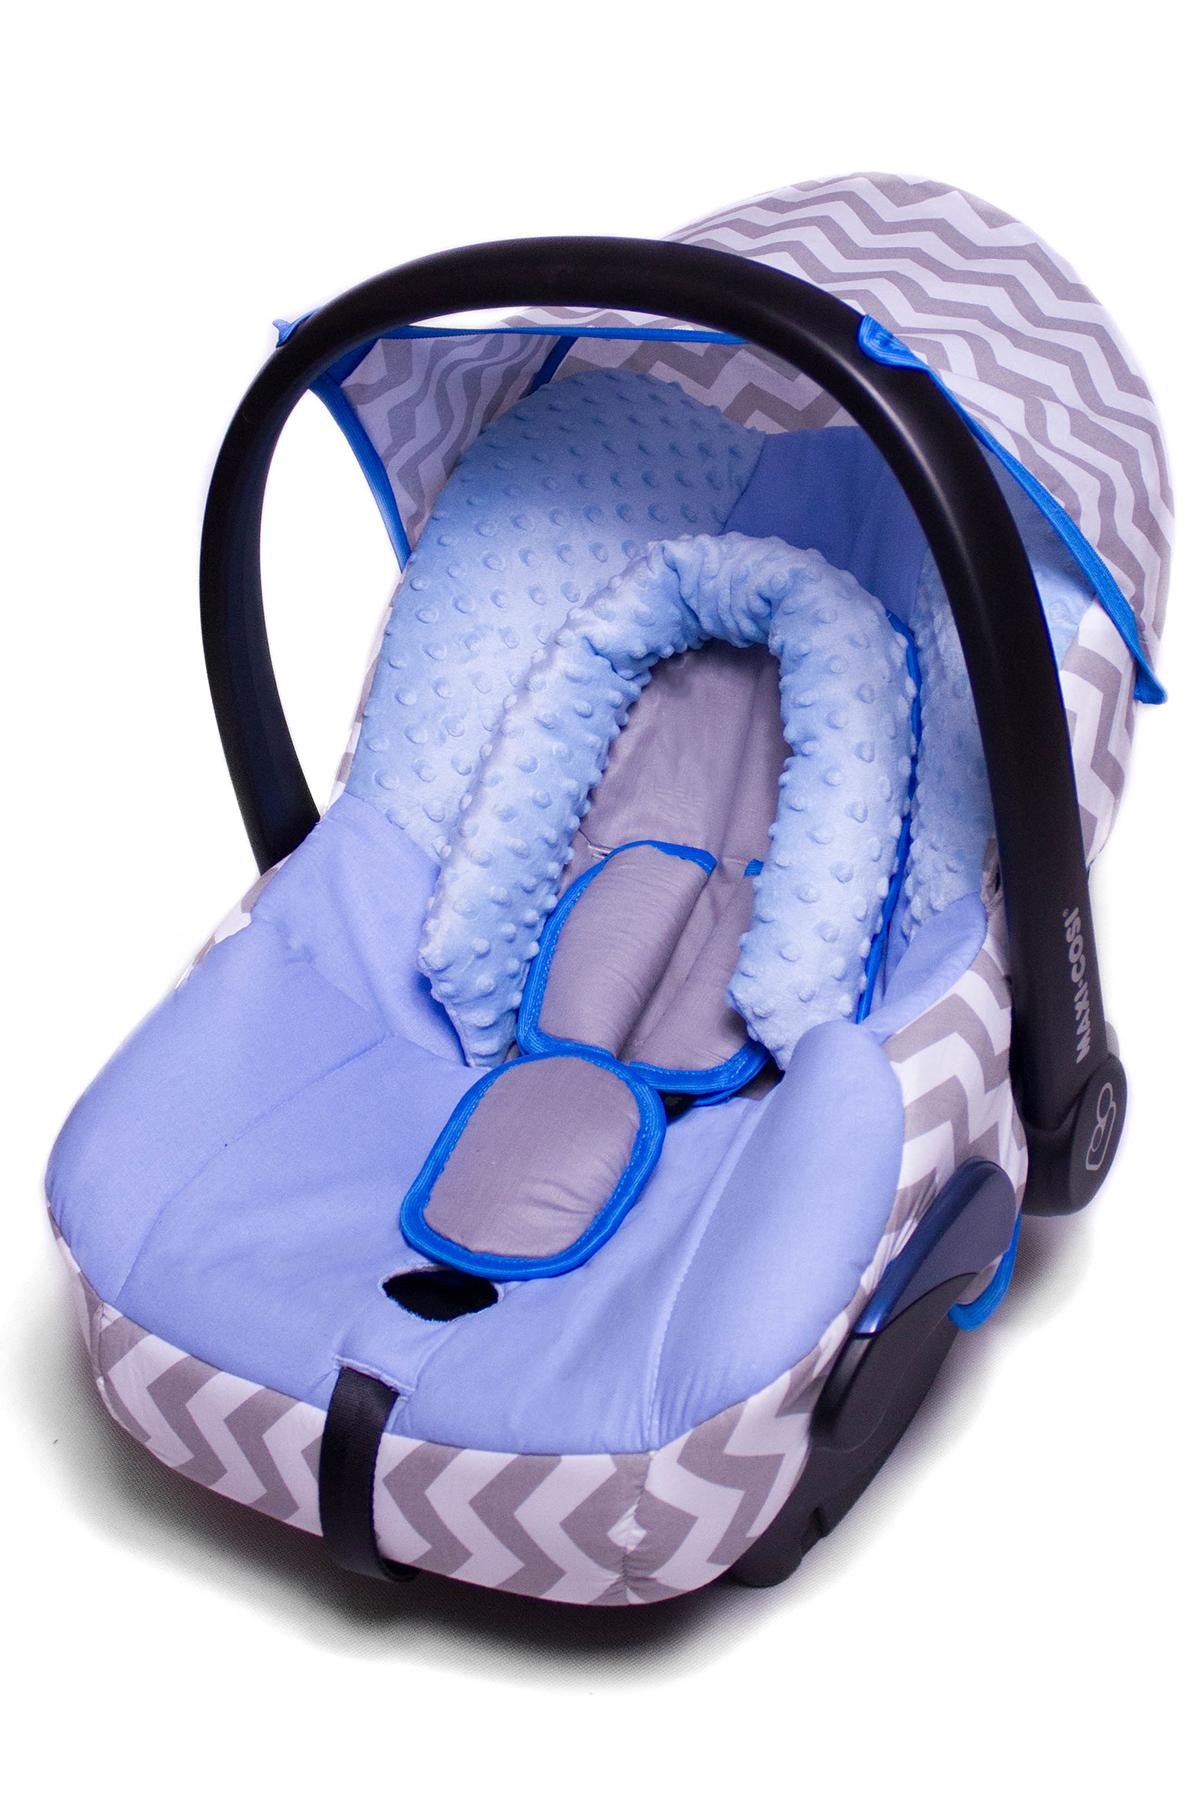 baby car seat full cover set fitting maxi cosi cabriofix rest head belt straps ebay. Black Bedroom Furniture Sets. Home Design Ideas